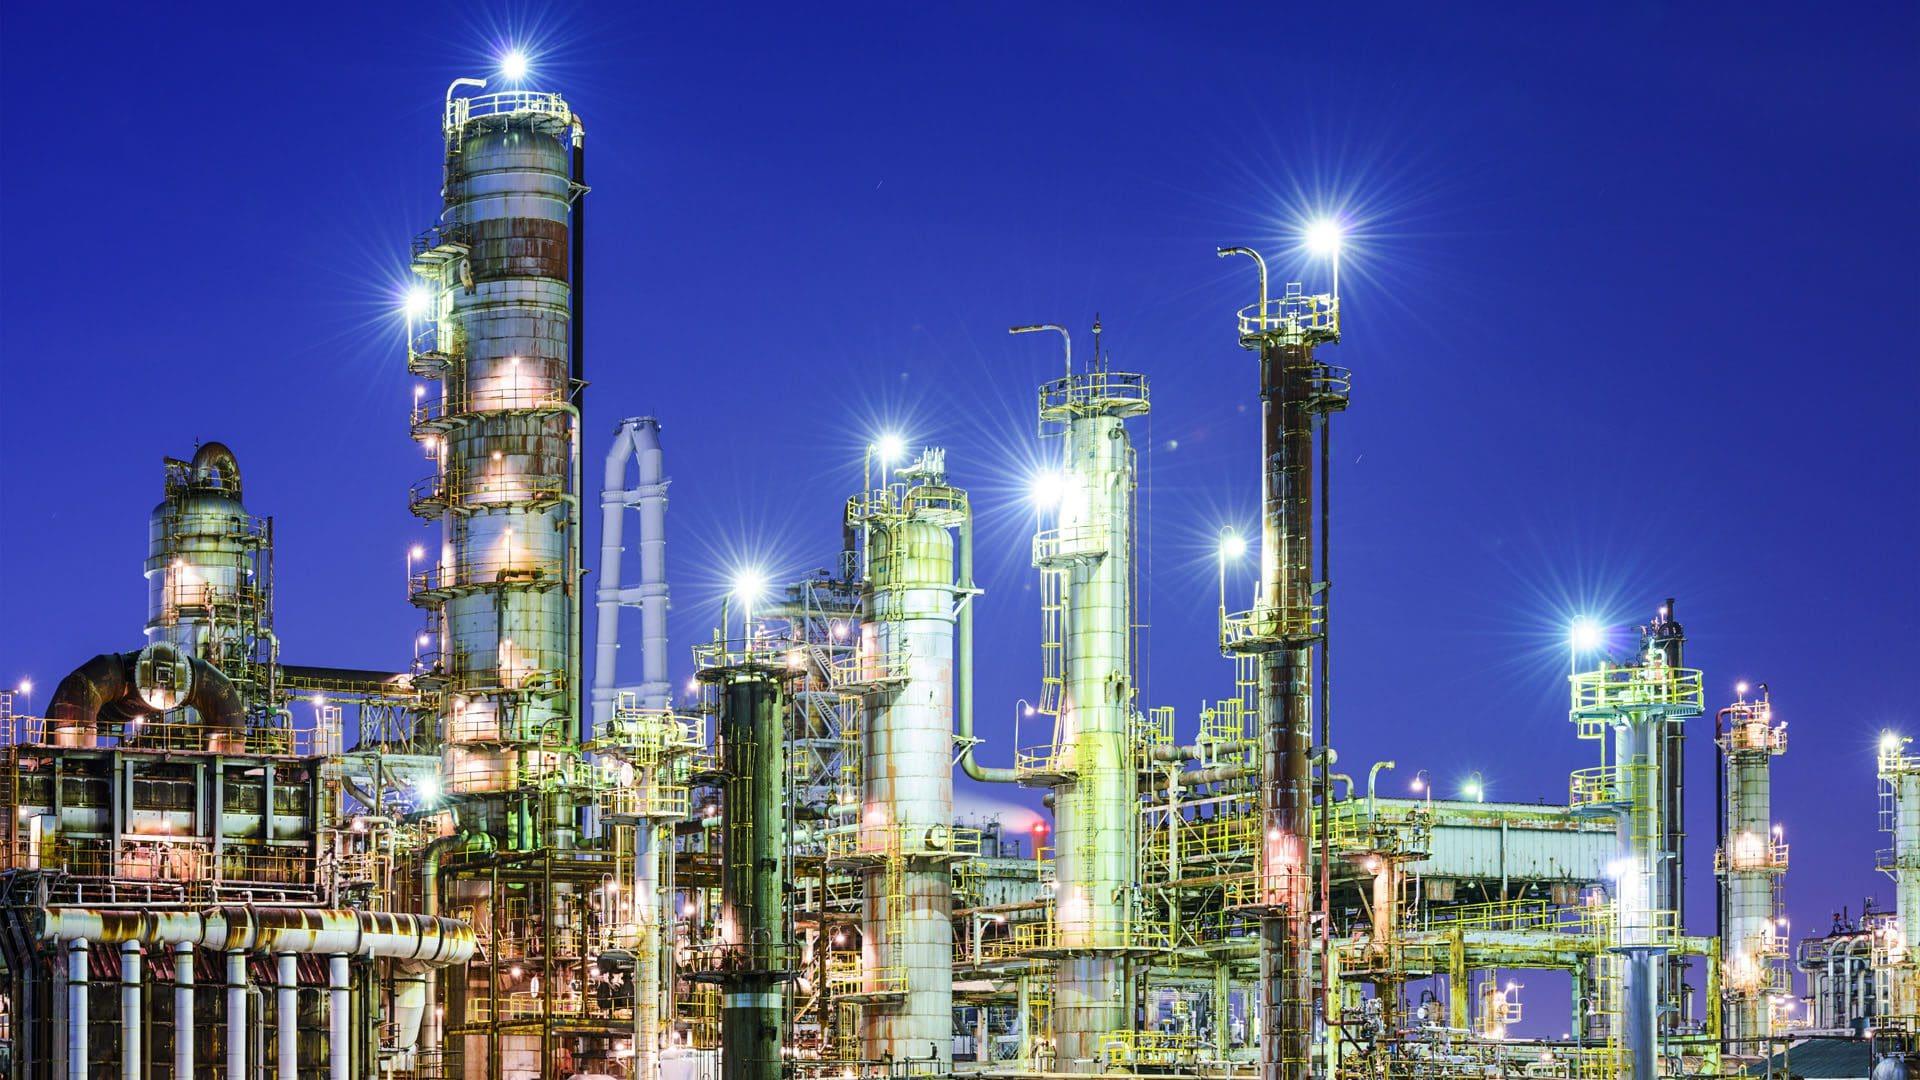 refinerynight19201080px